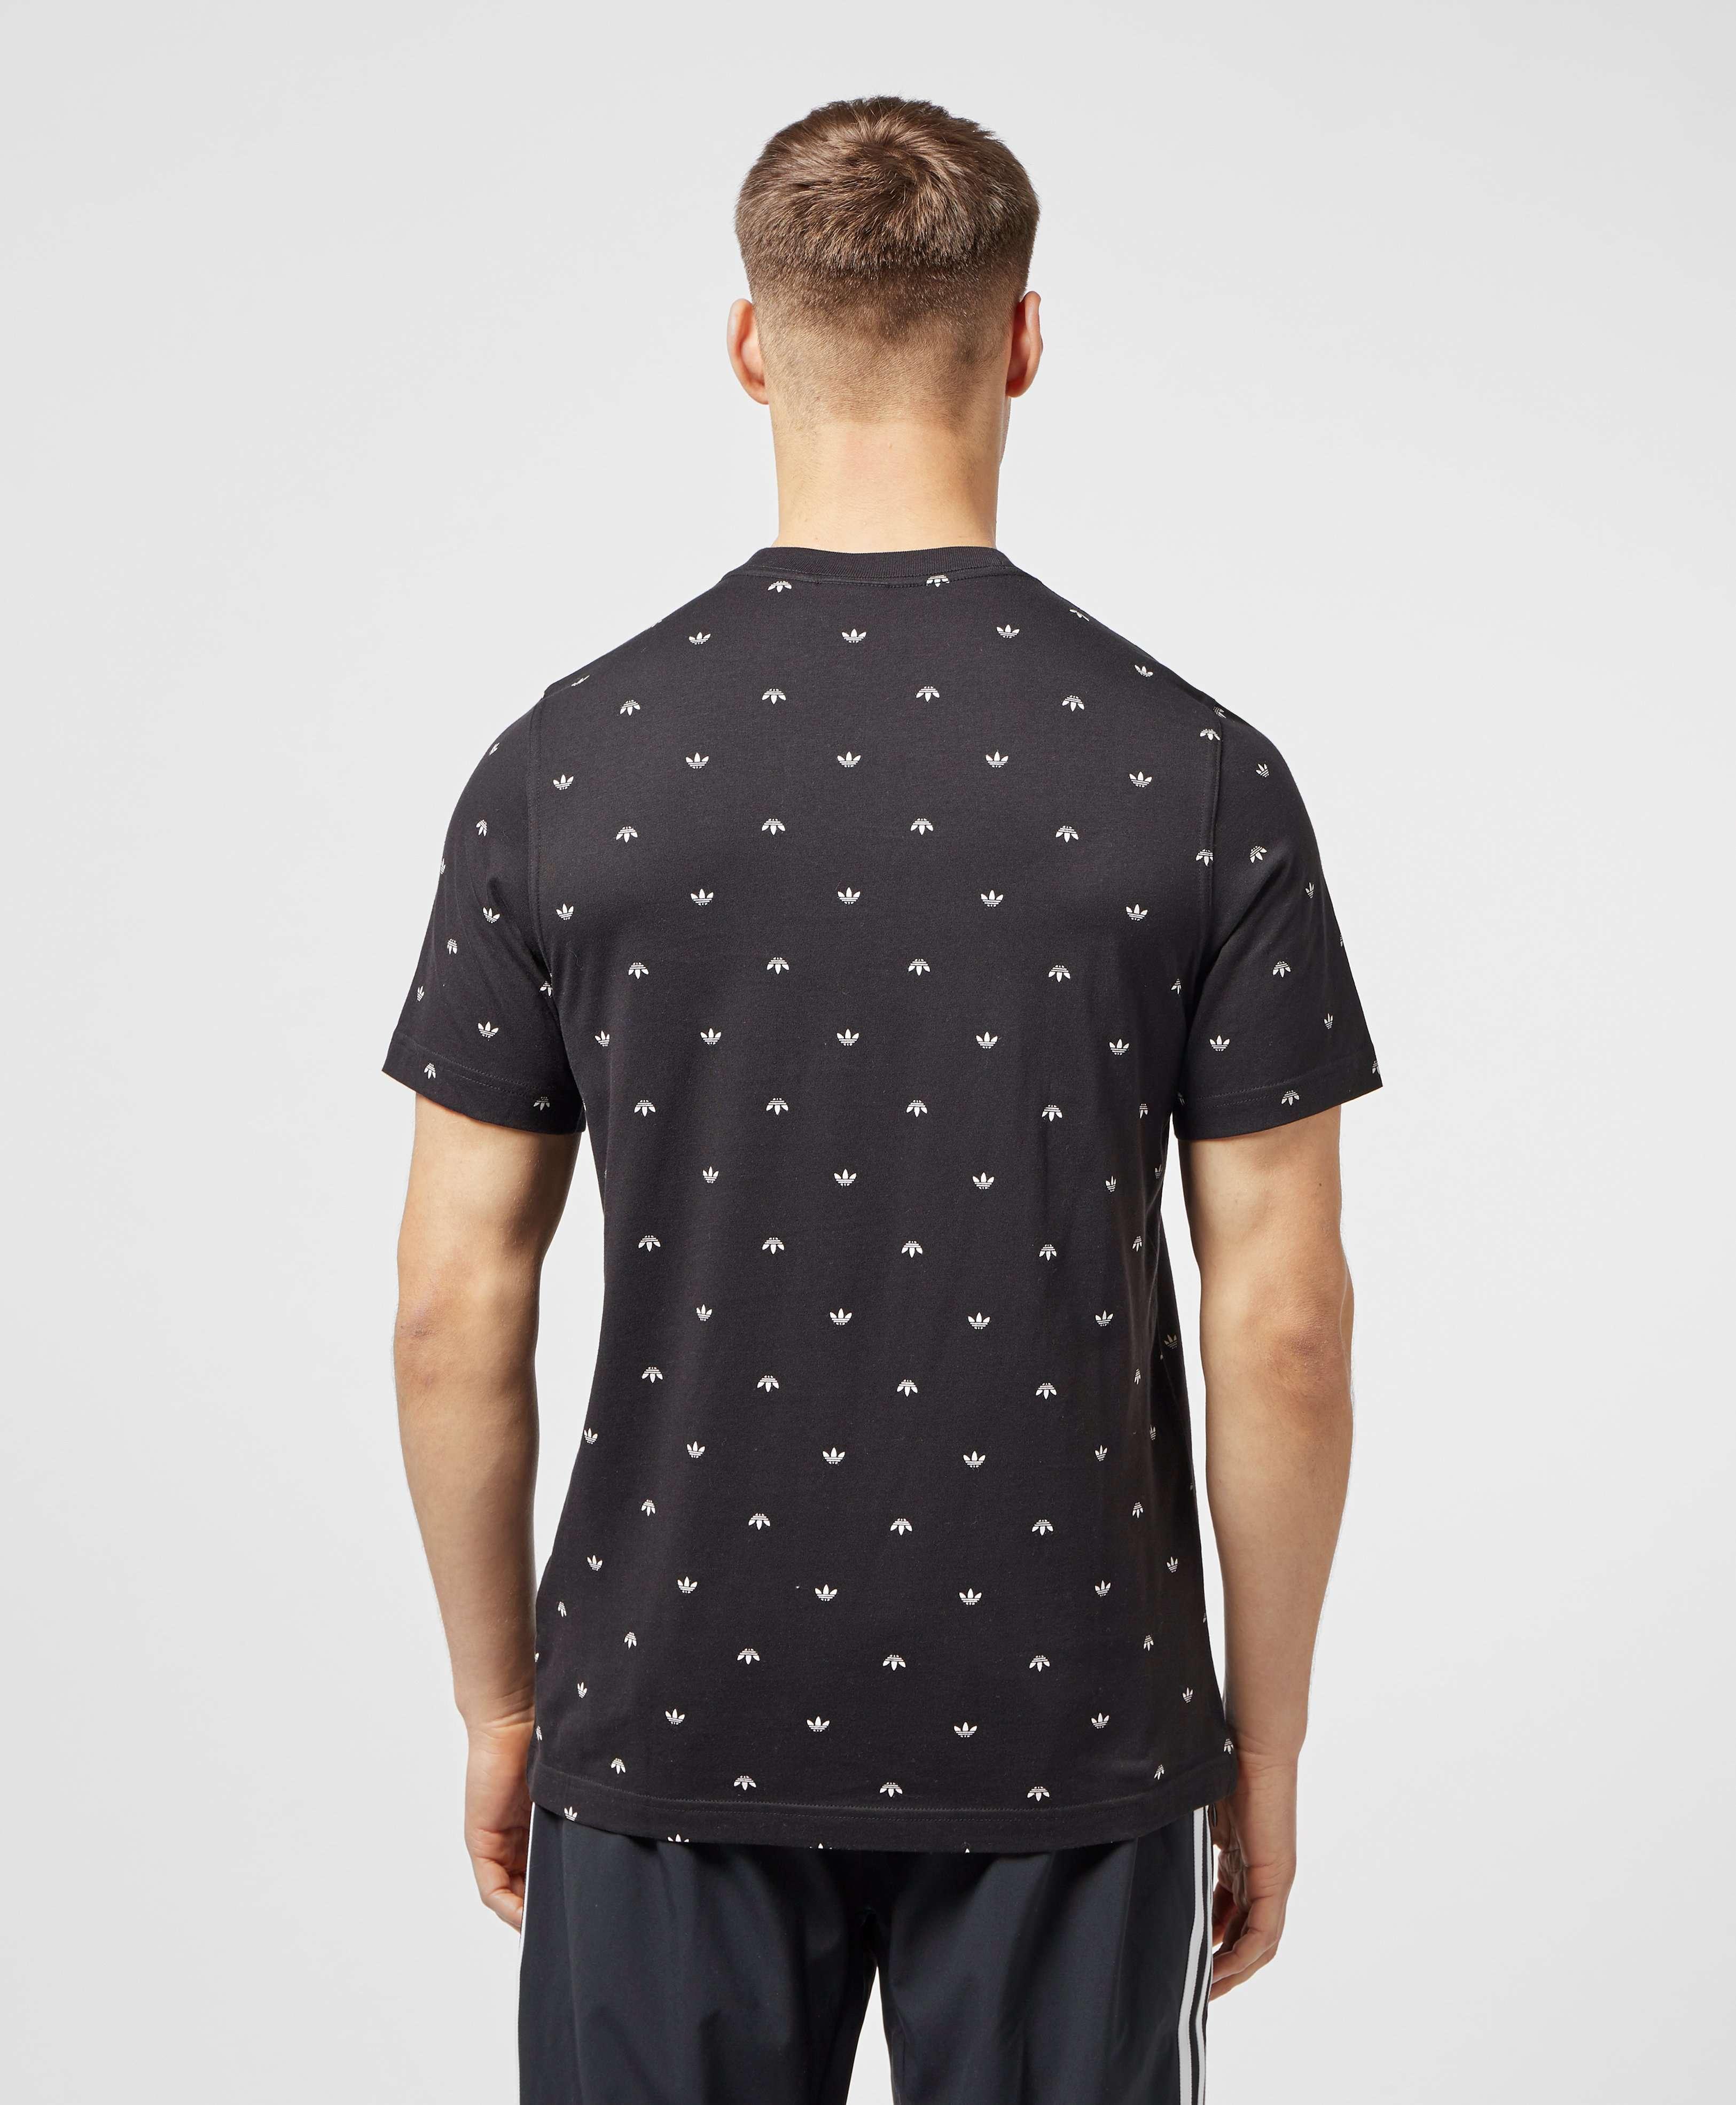 adidas Originals All Over Print Short Sleeve T-Shirt